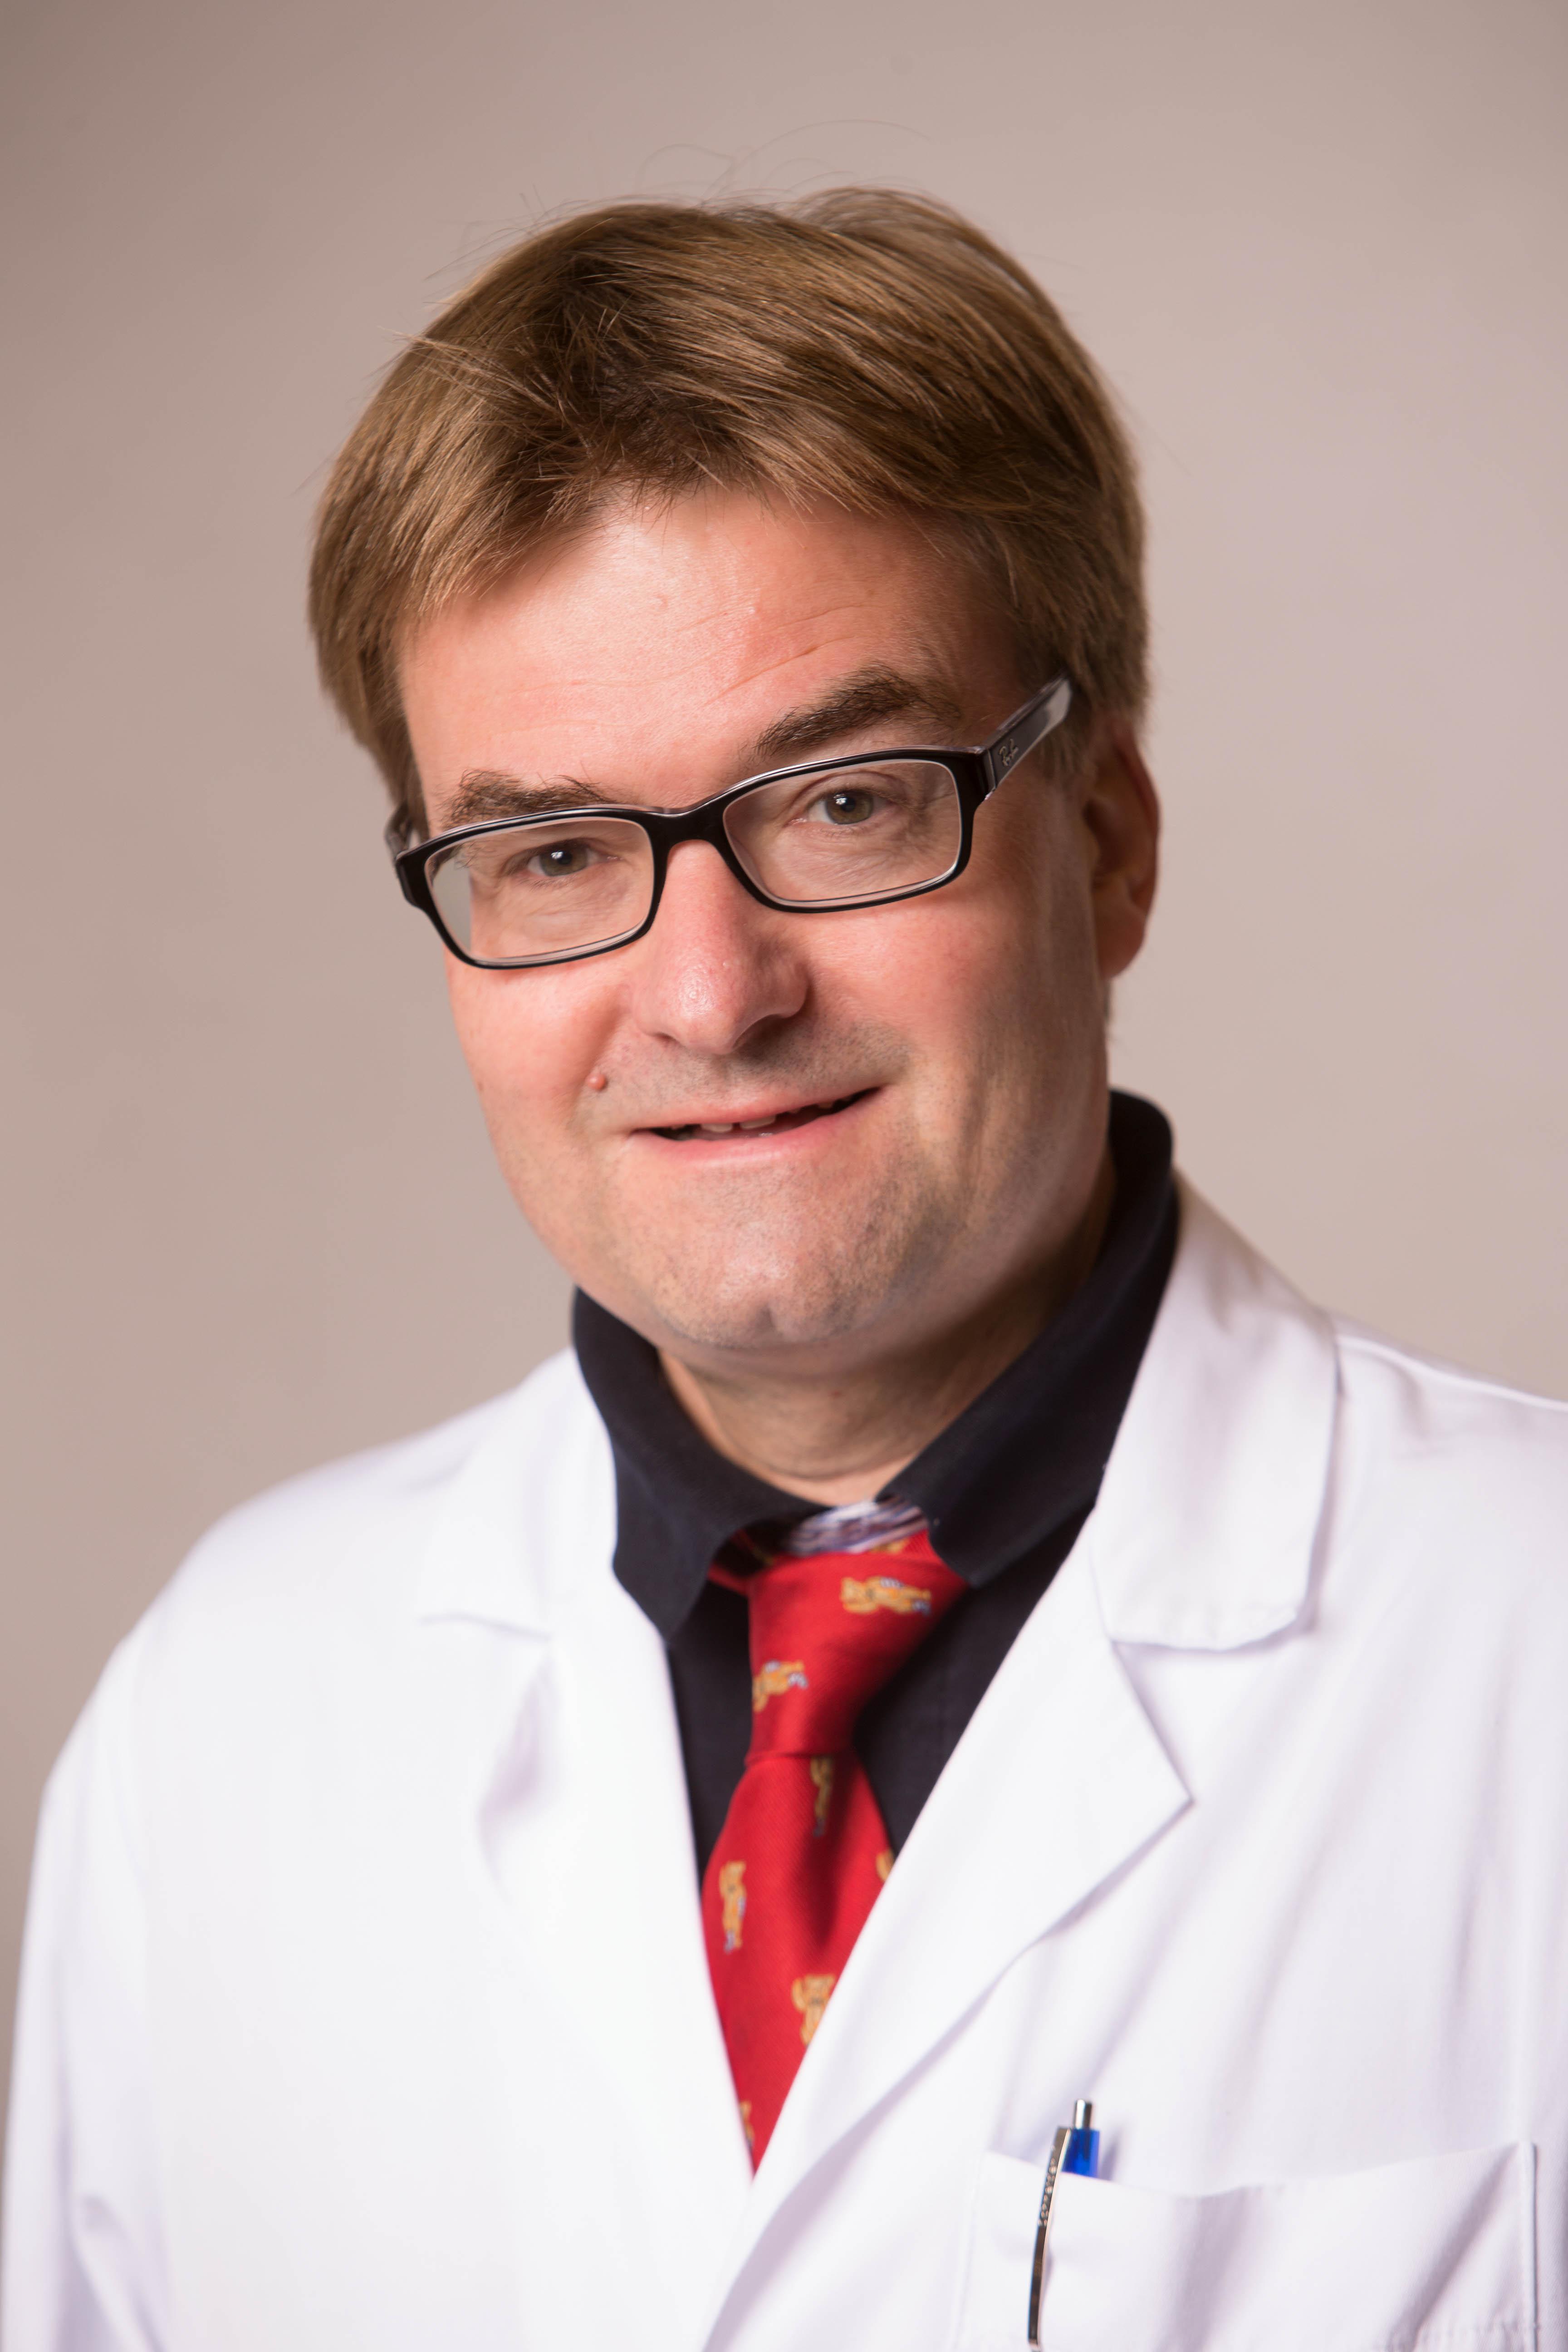 Dr Malzacher